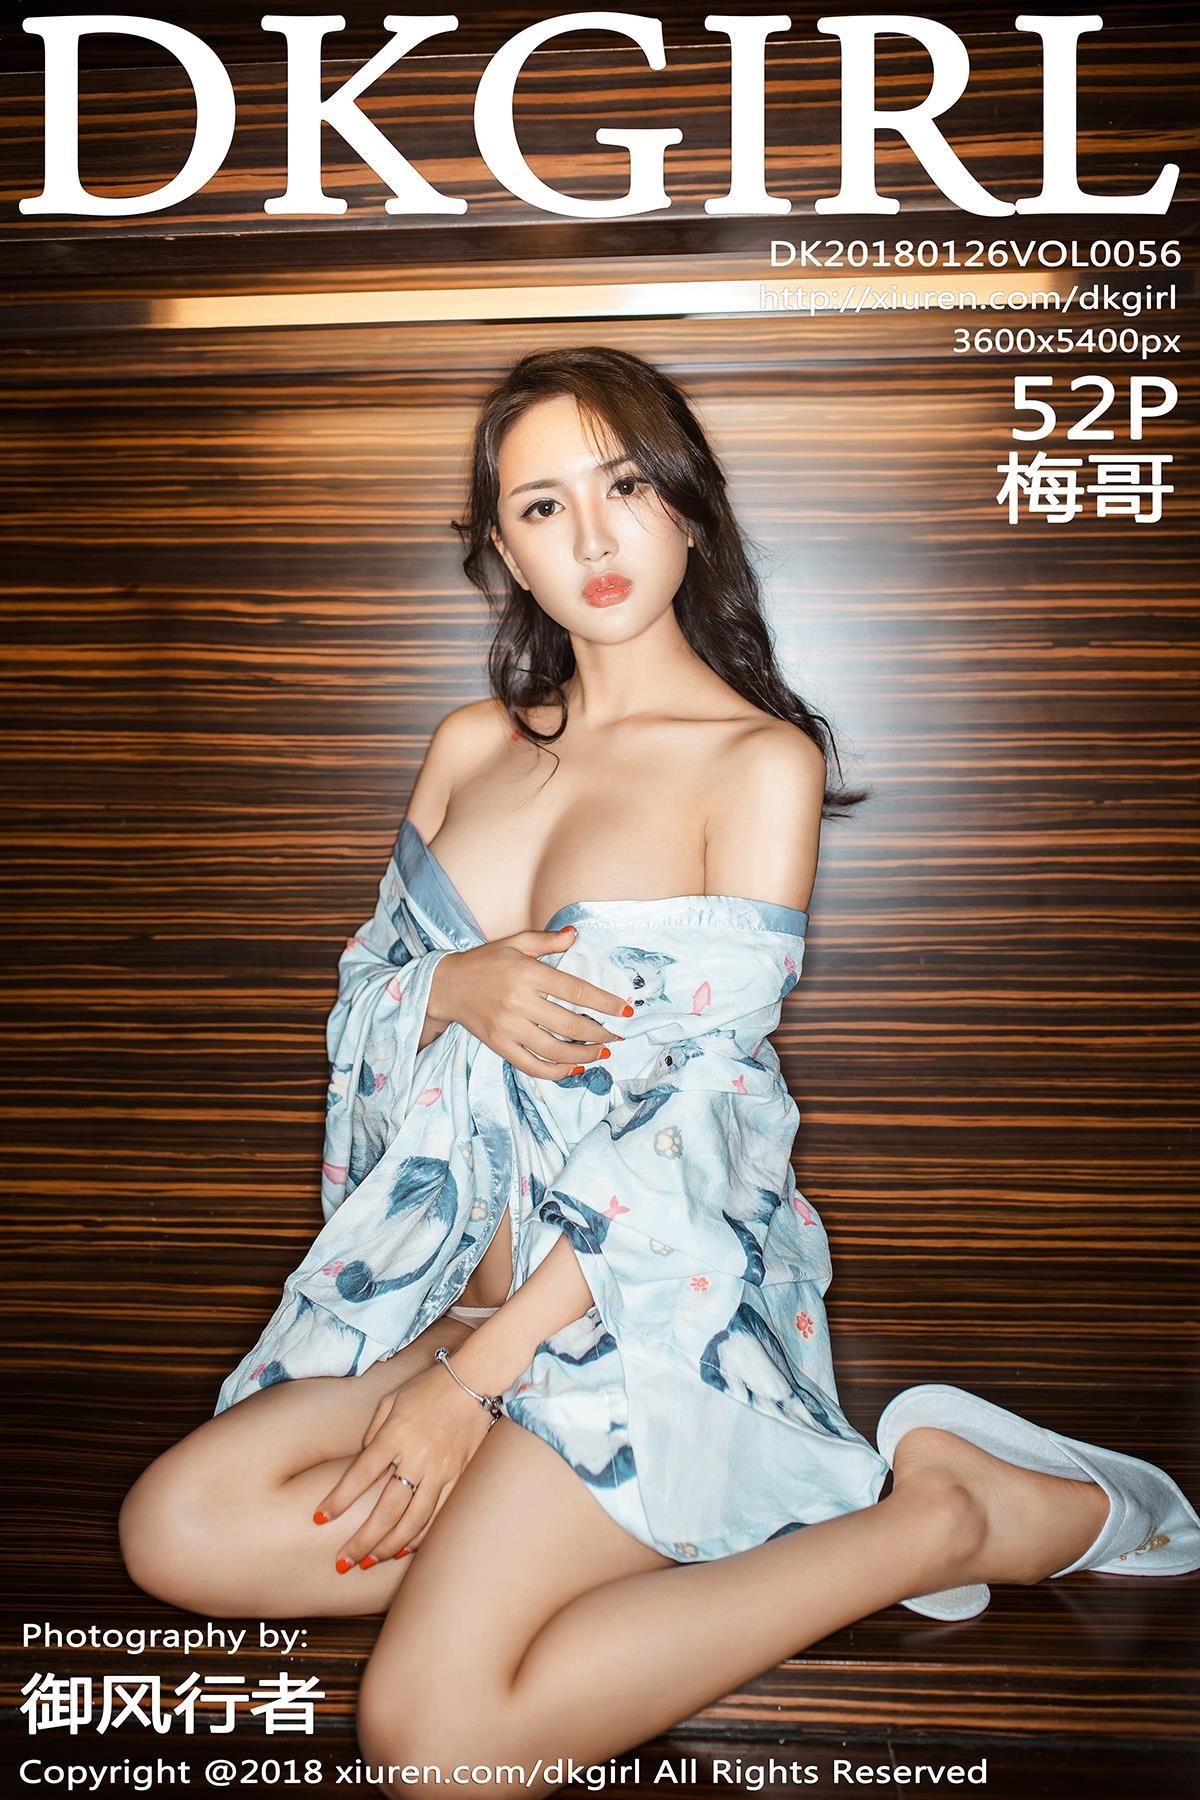 [DKGirl御女郎]DK20180126VOL0056 梅哥 蓝色睡袍与性感情趣内衣私房写真集